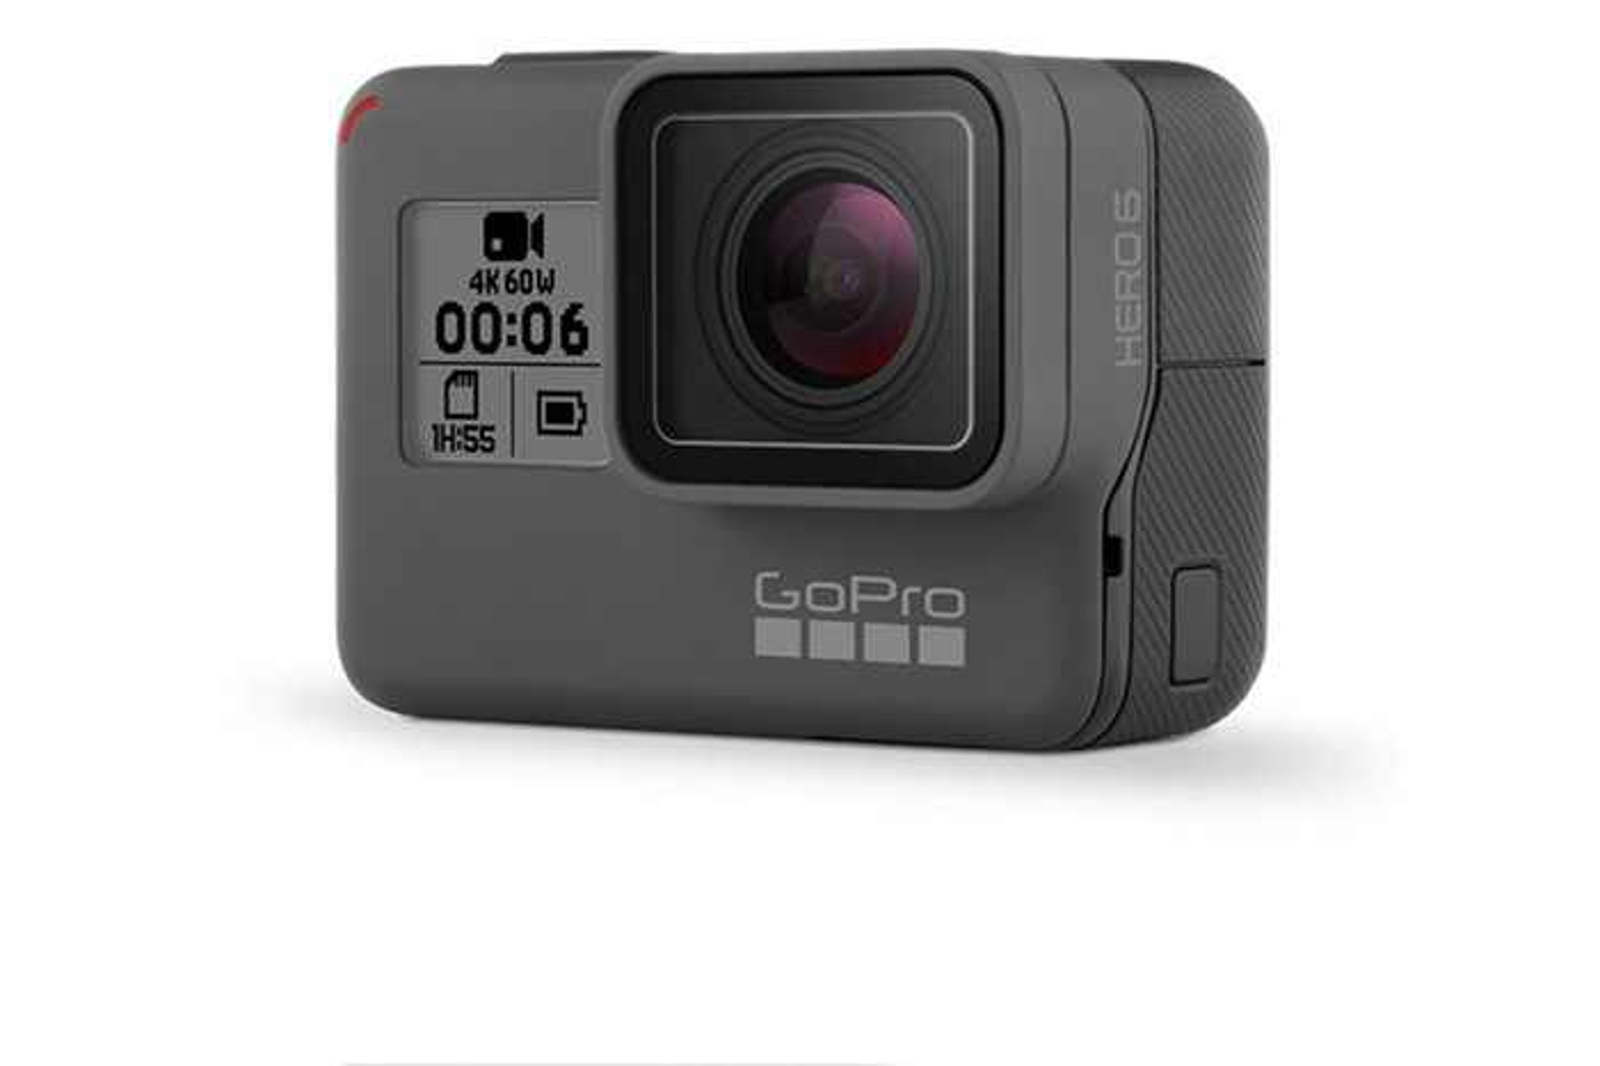 GoPro Hero camera.